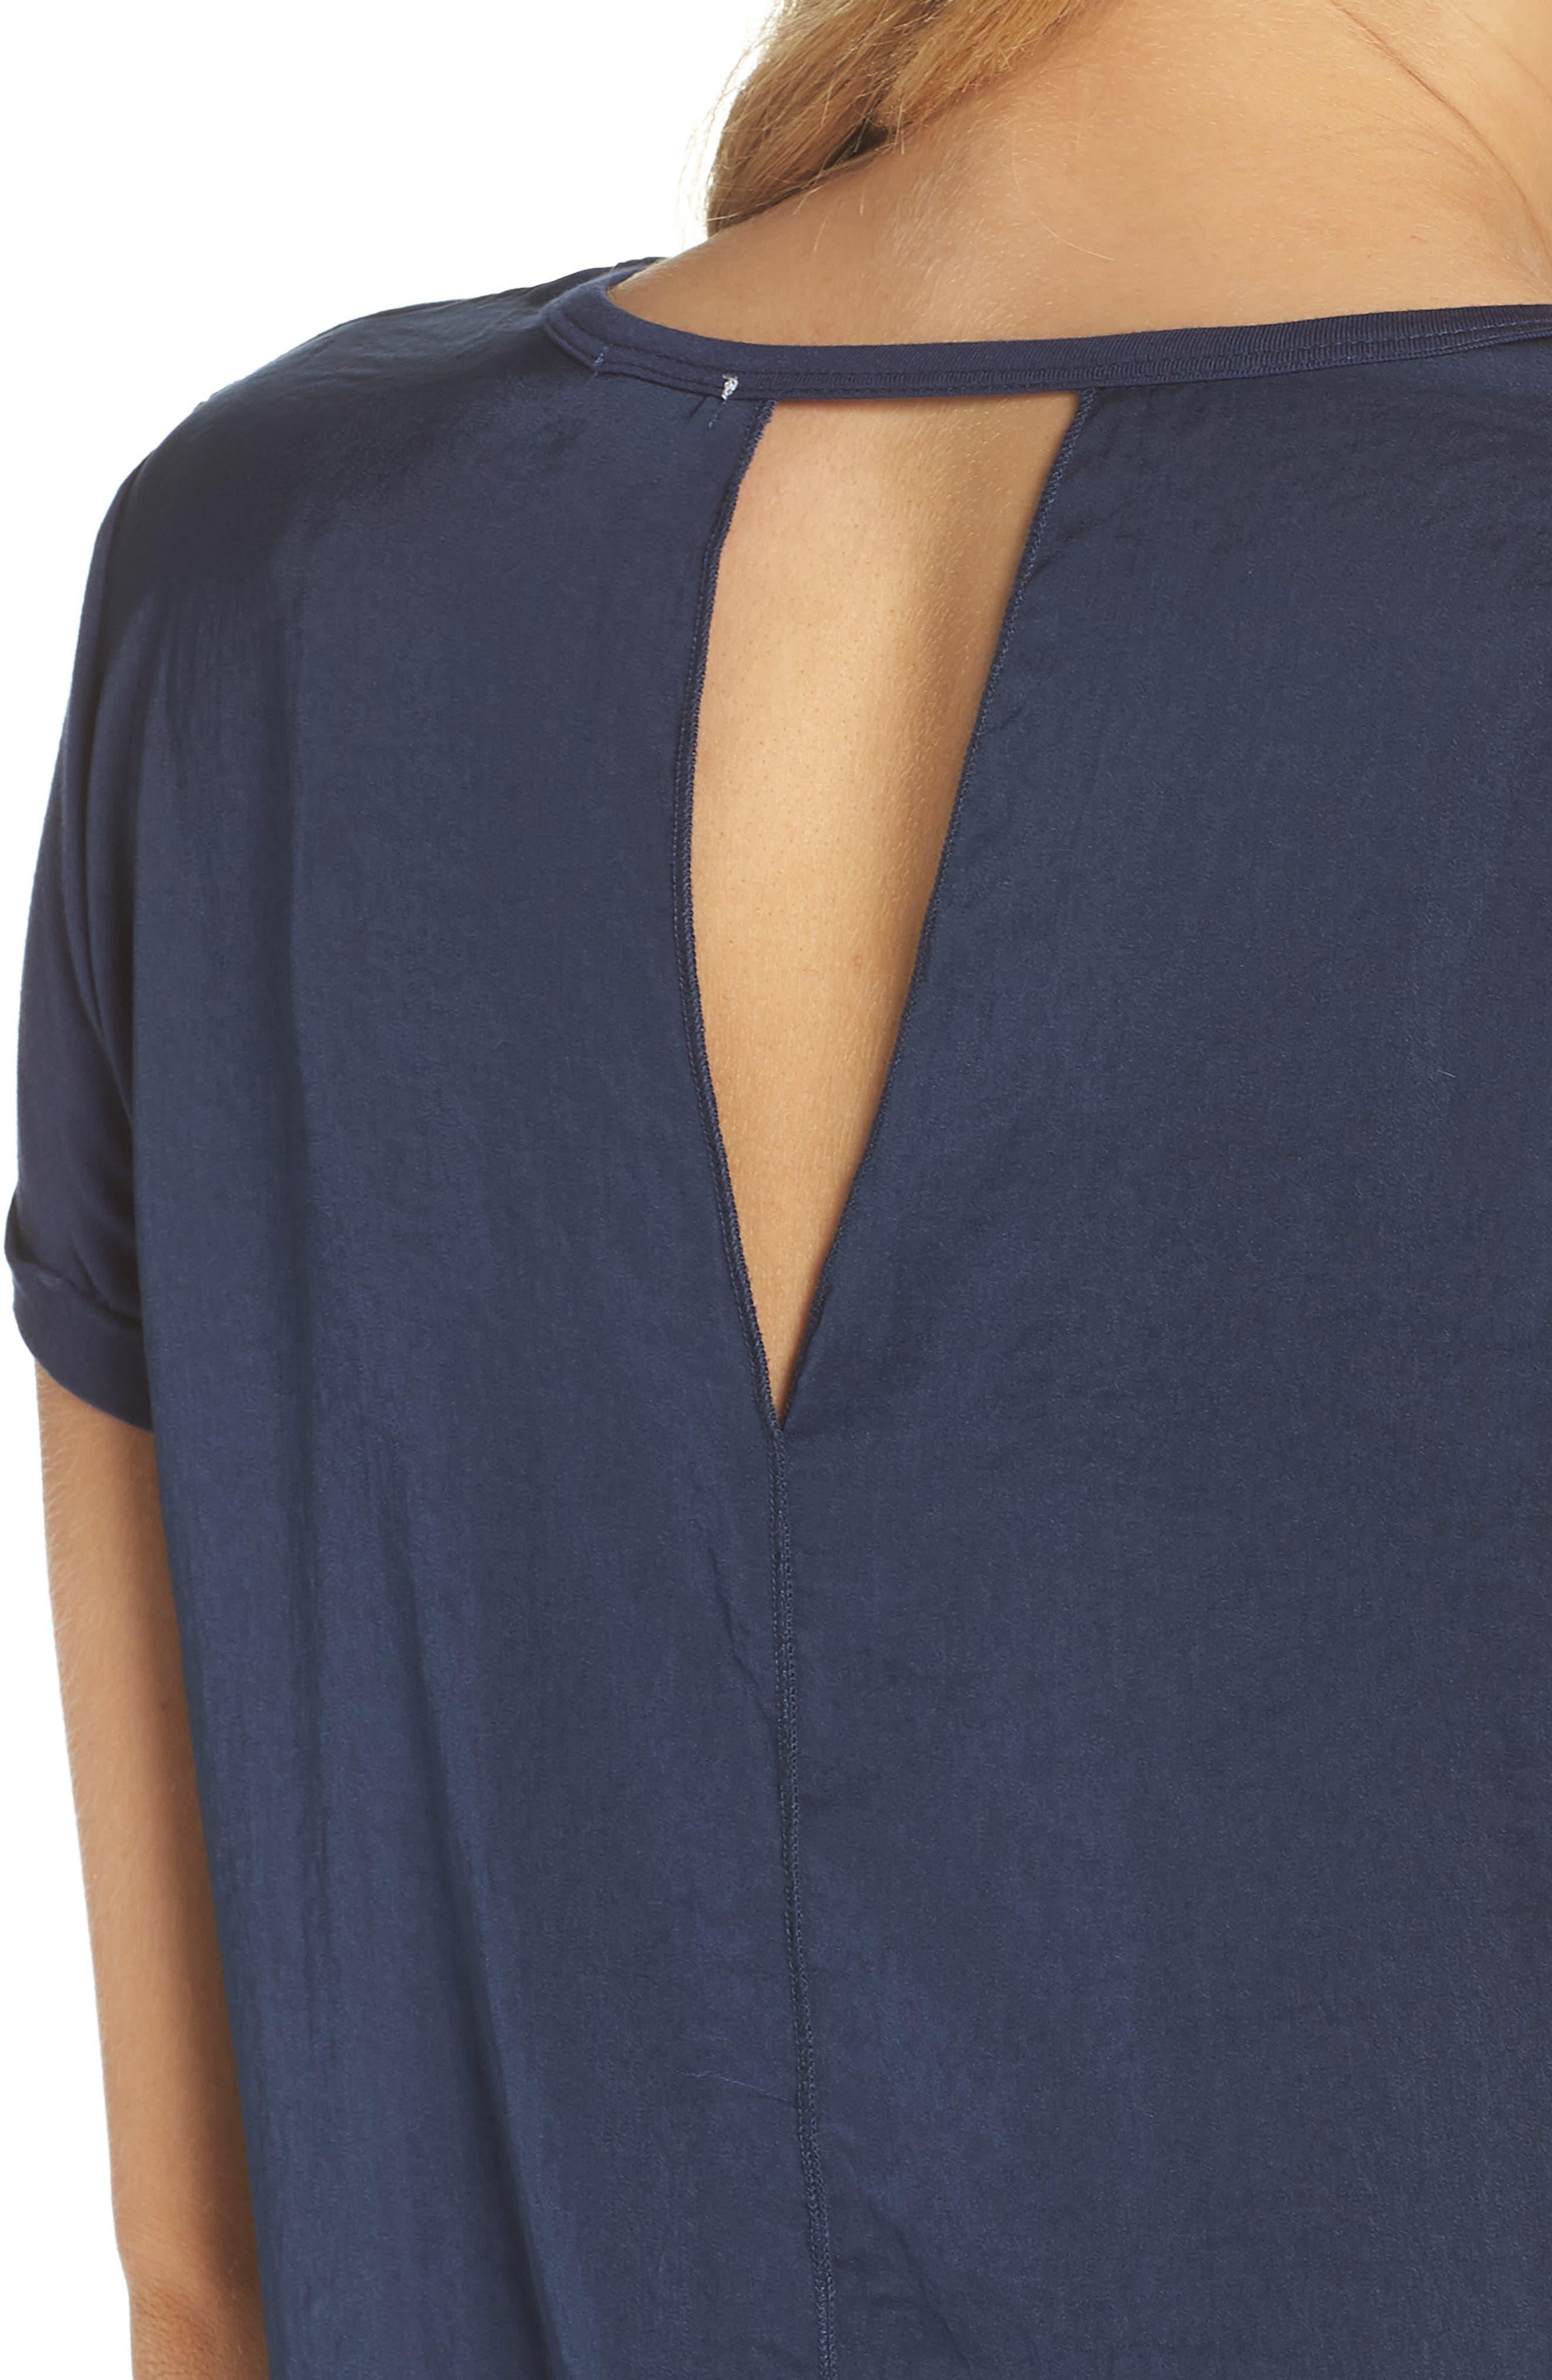 Pajama Tee,                             Alternate thumbnail 7, color,                             Navy